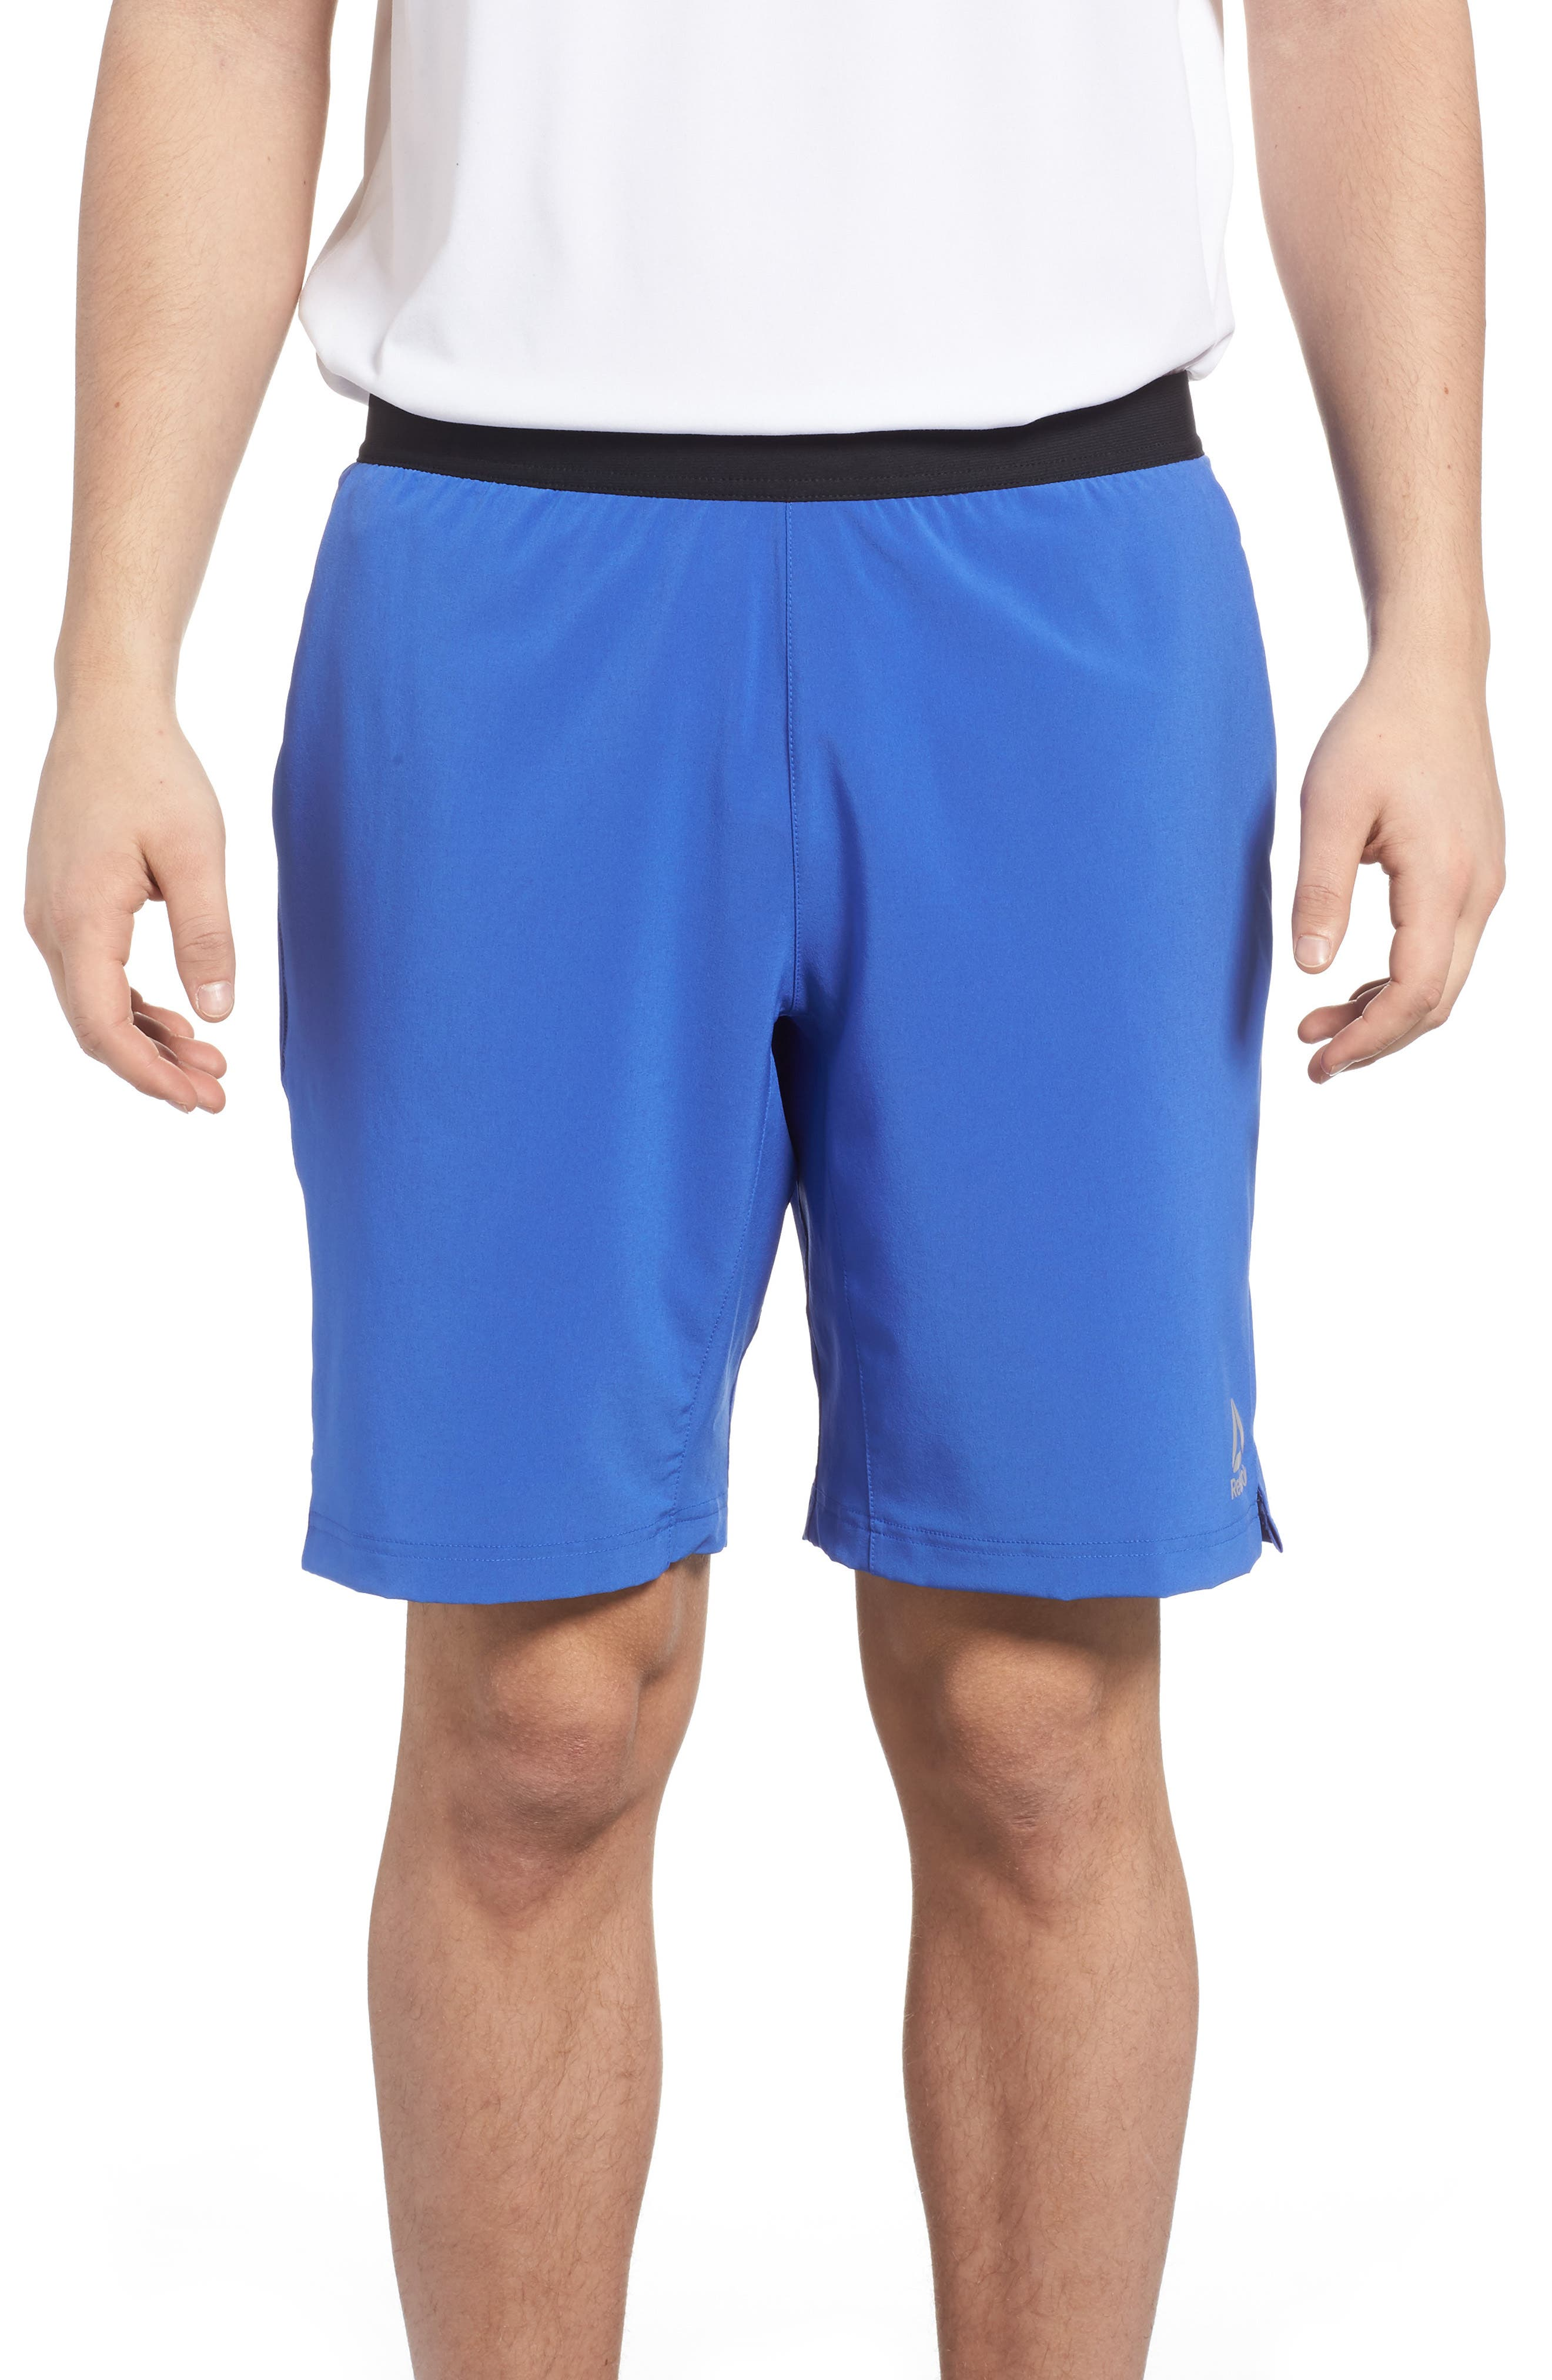 Speedwick Speed Training Shorts,                             Main thumbnail 1, color,                             Acid Blue S18-R